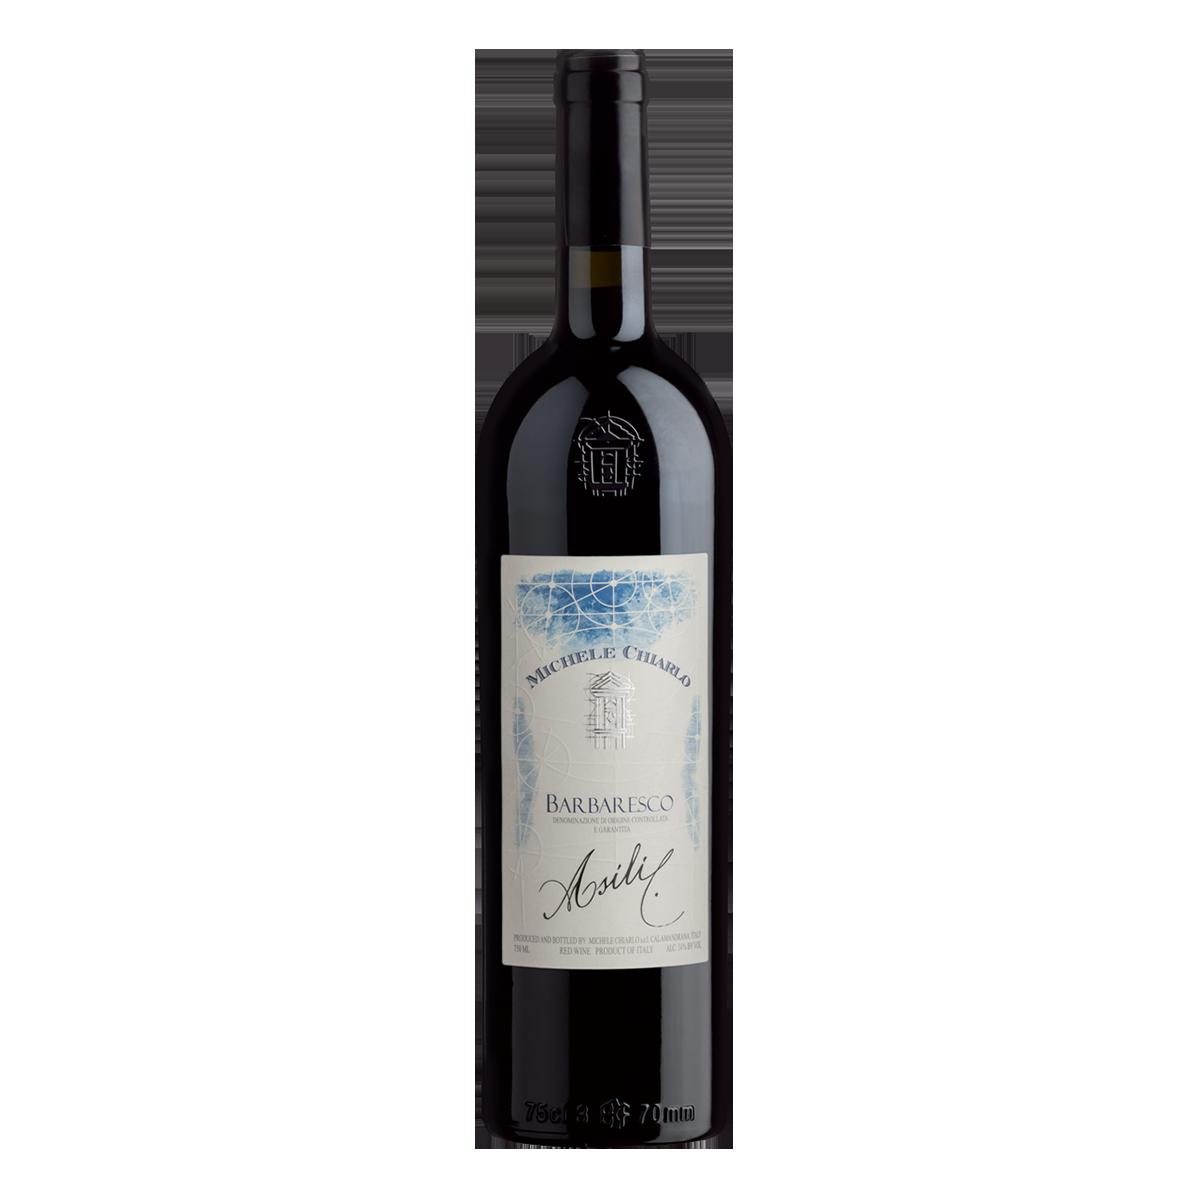 ITPC1101-12 義大利佳樂巴巴列斯科2012阿希利園頂級紅酒 Michele Chiarlo Barbaresco D.O.C.G. Asili